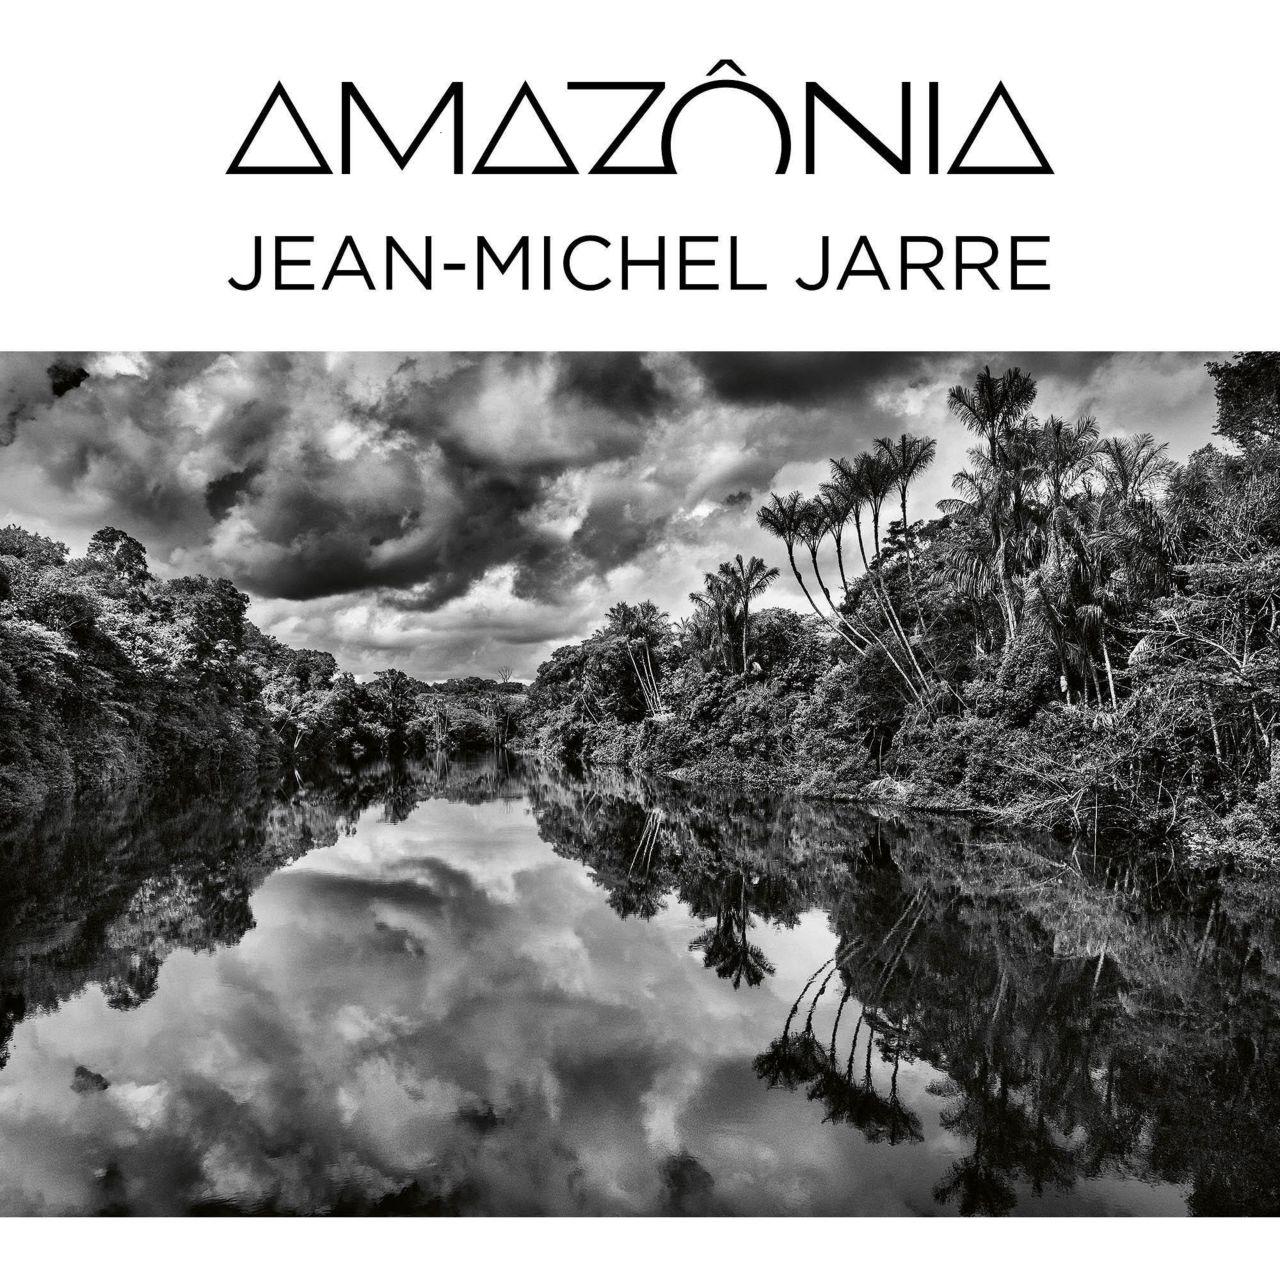 Jean Michel Jarre - Amazonia - 2LP